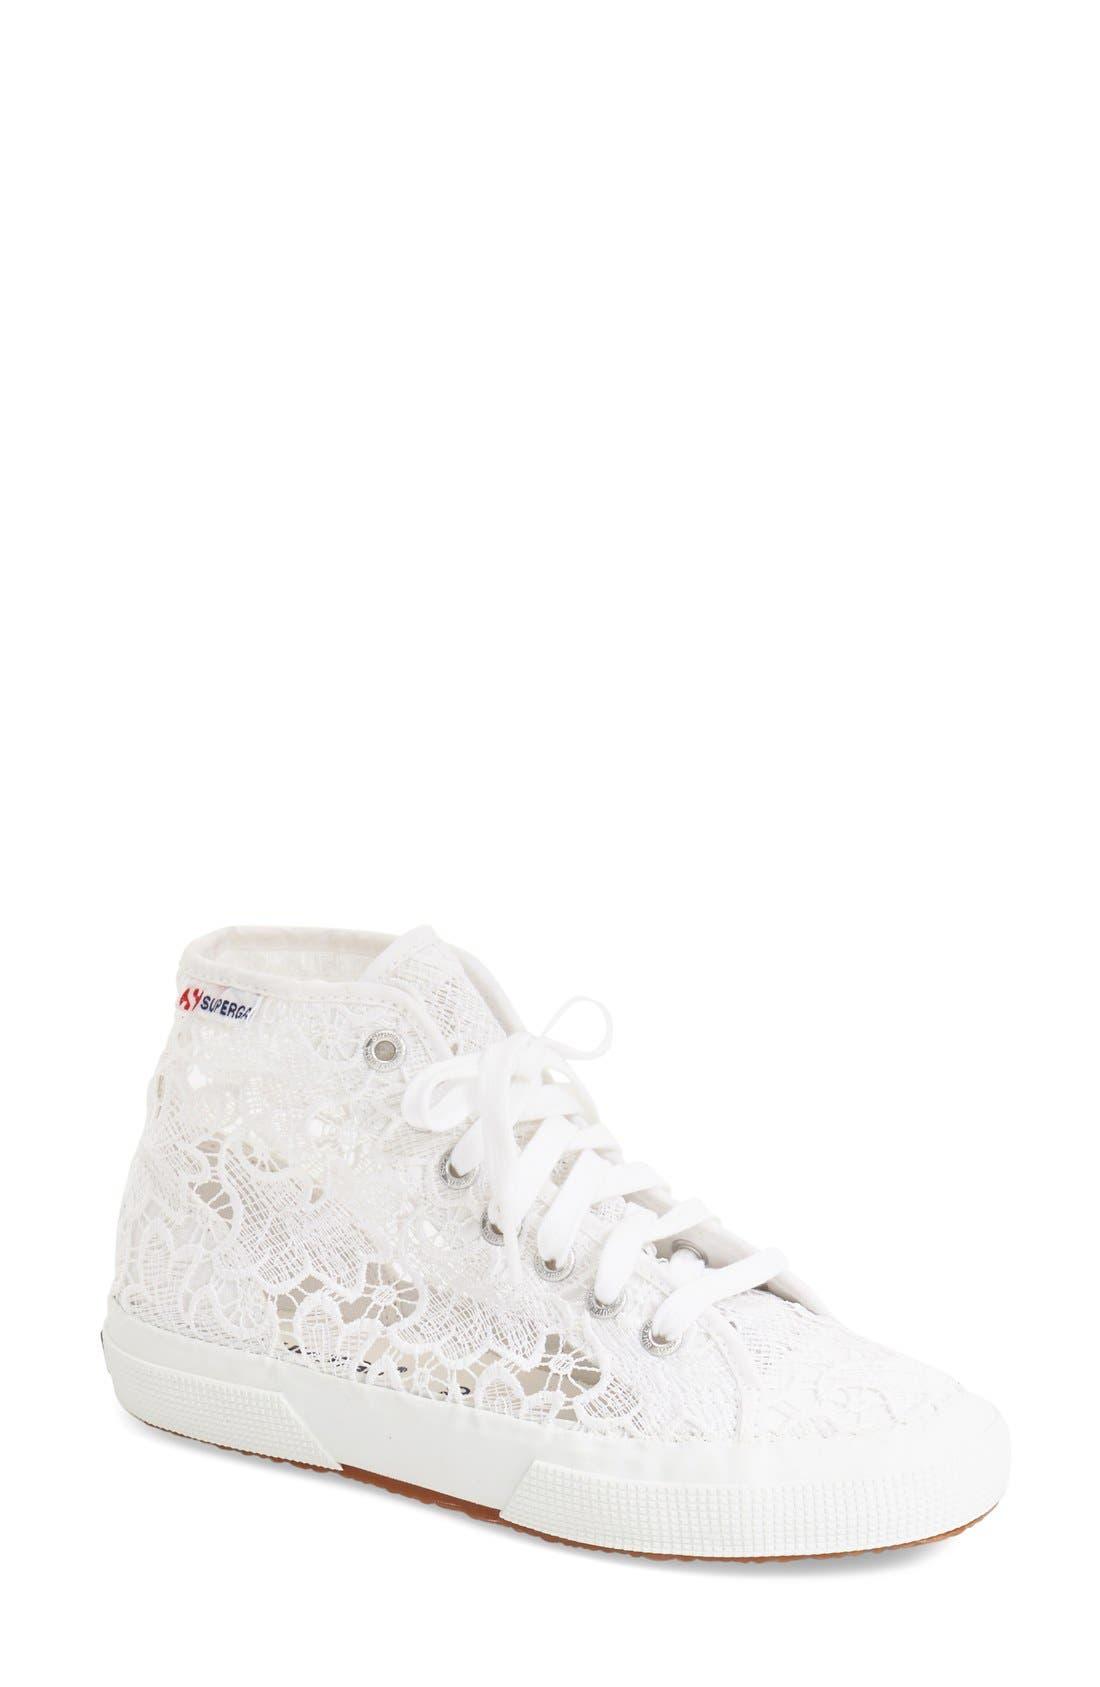 Alternate Image 1 Selected - Superga 'Macramew' High Top Sneaker (Women)